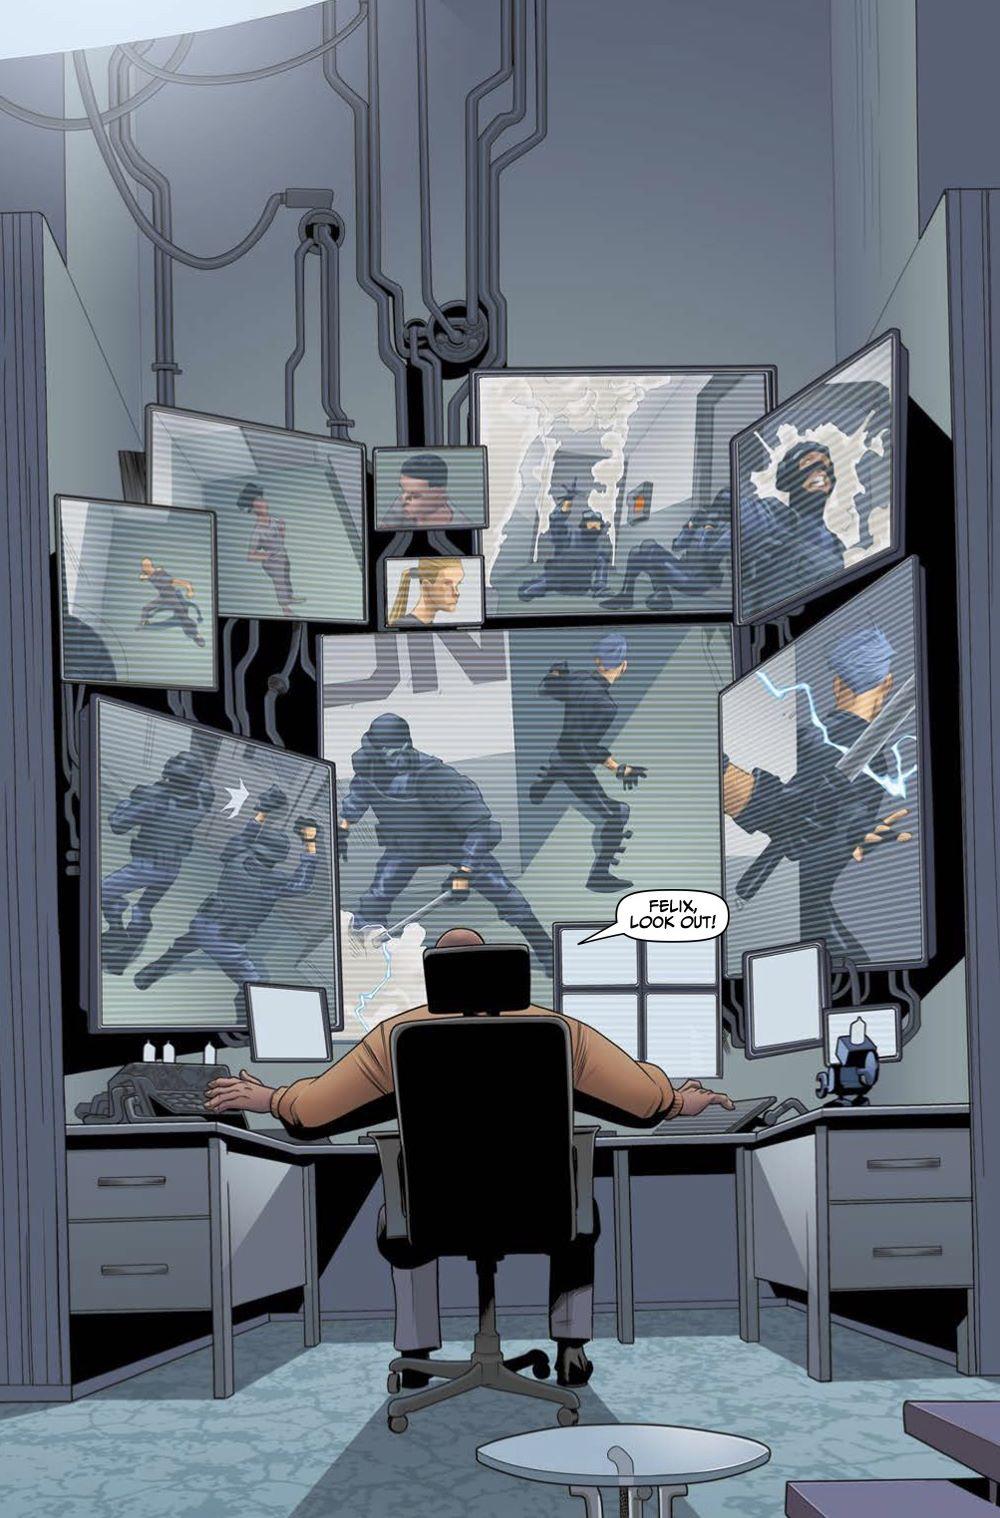 ExtraOrdinary-4-Page-1 ComicList Previews: EXTRAORDINARY #4